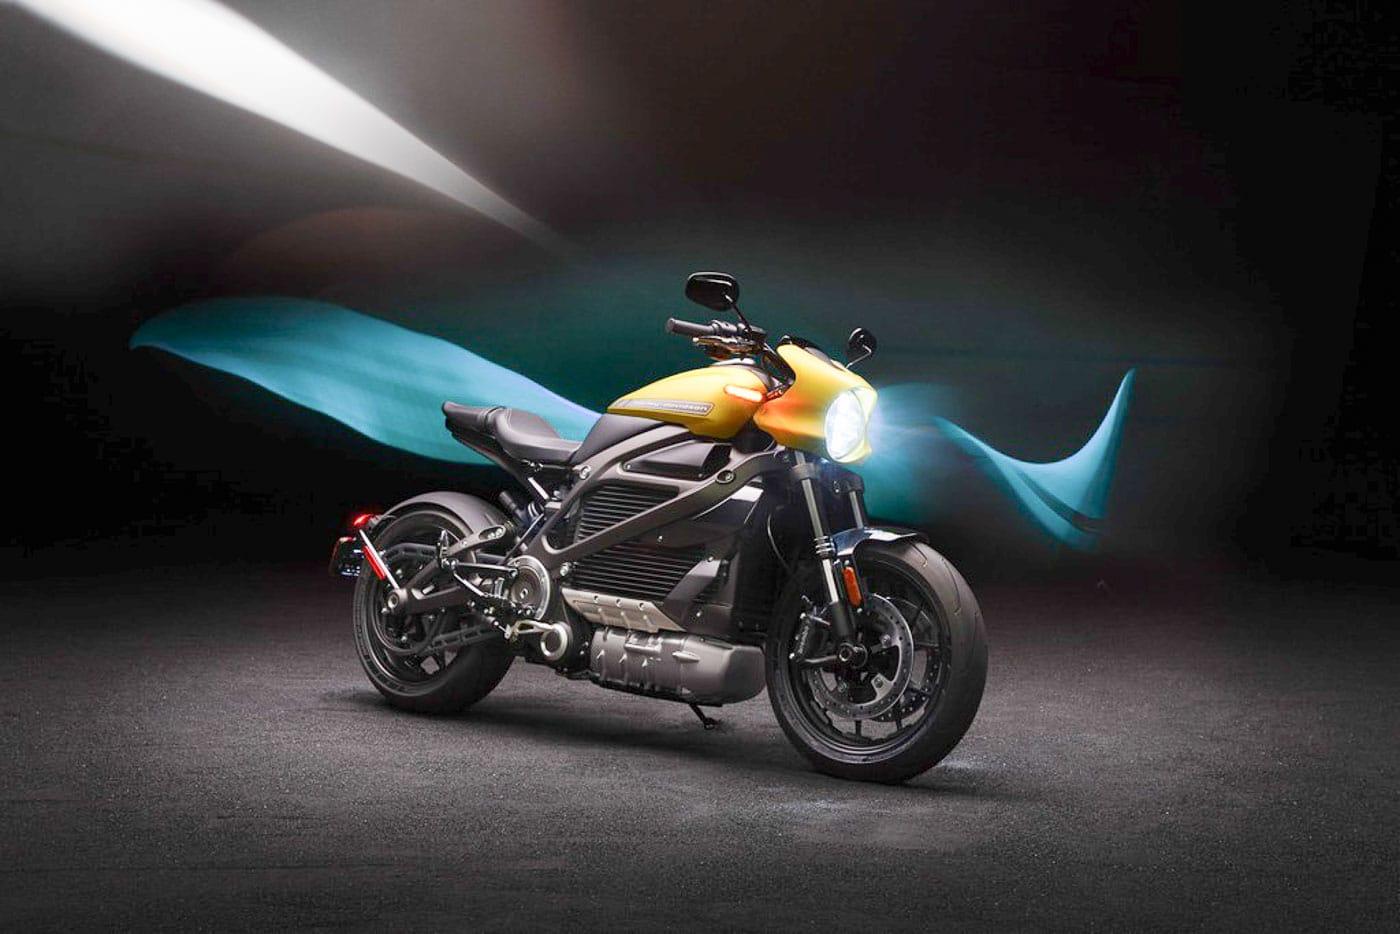 2020 Harley-Davidson lineup